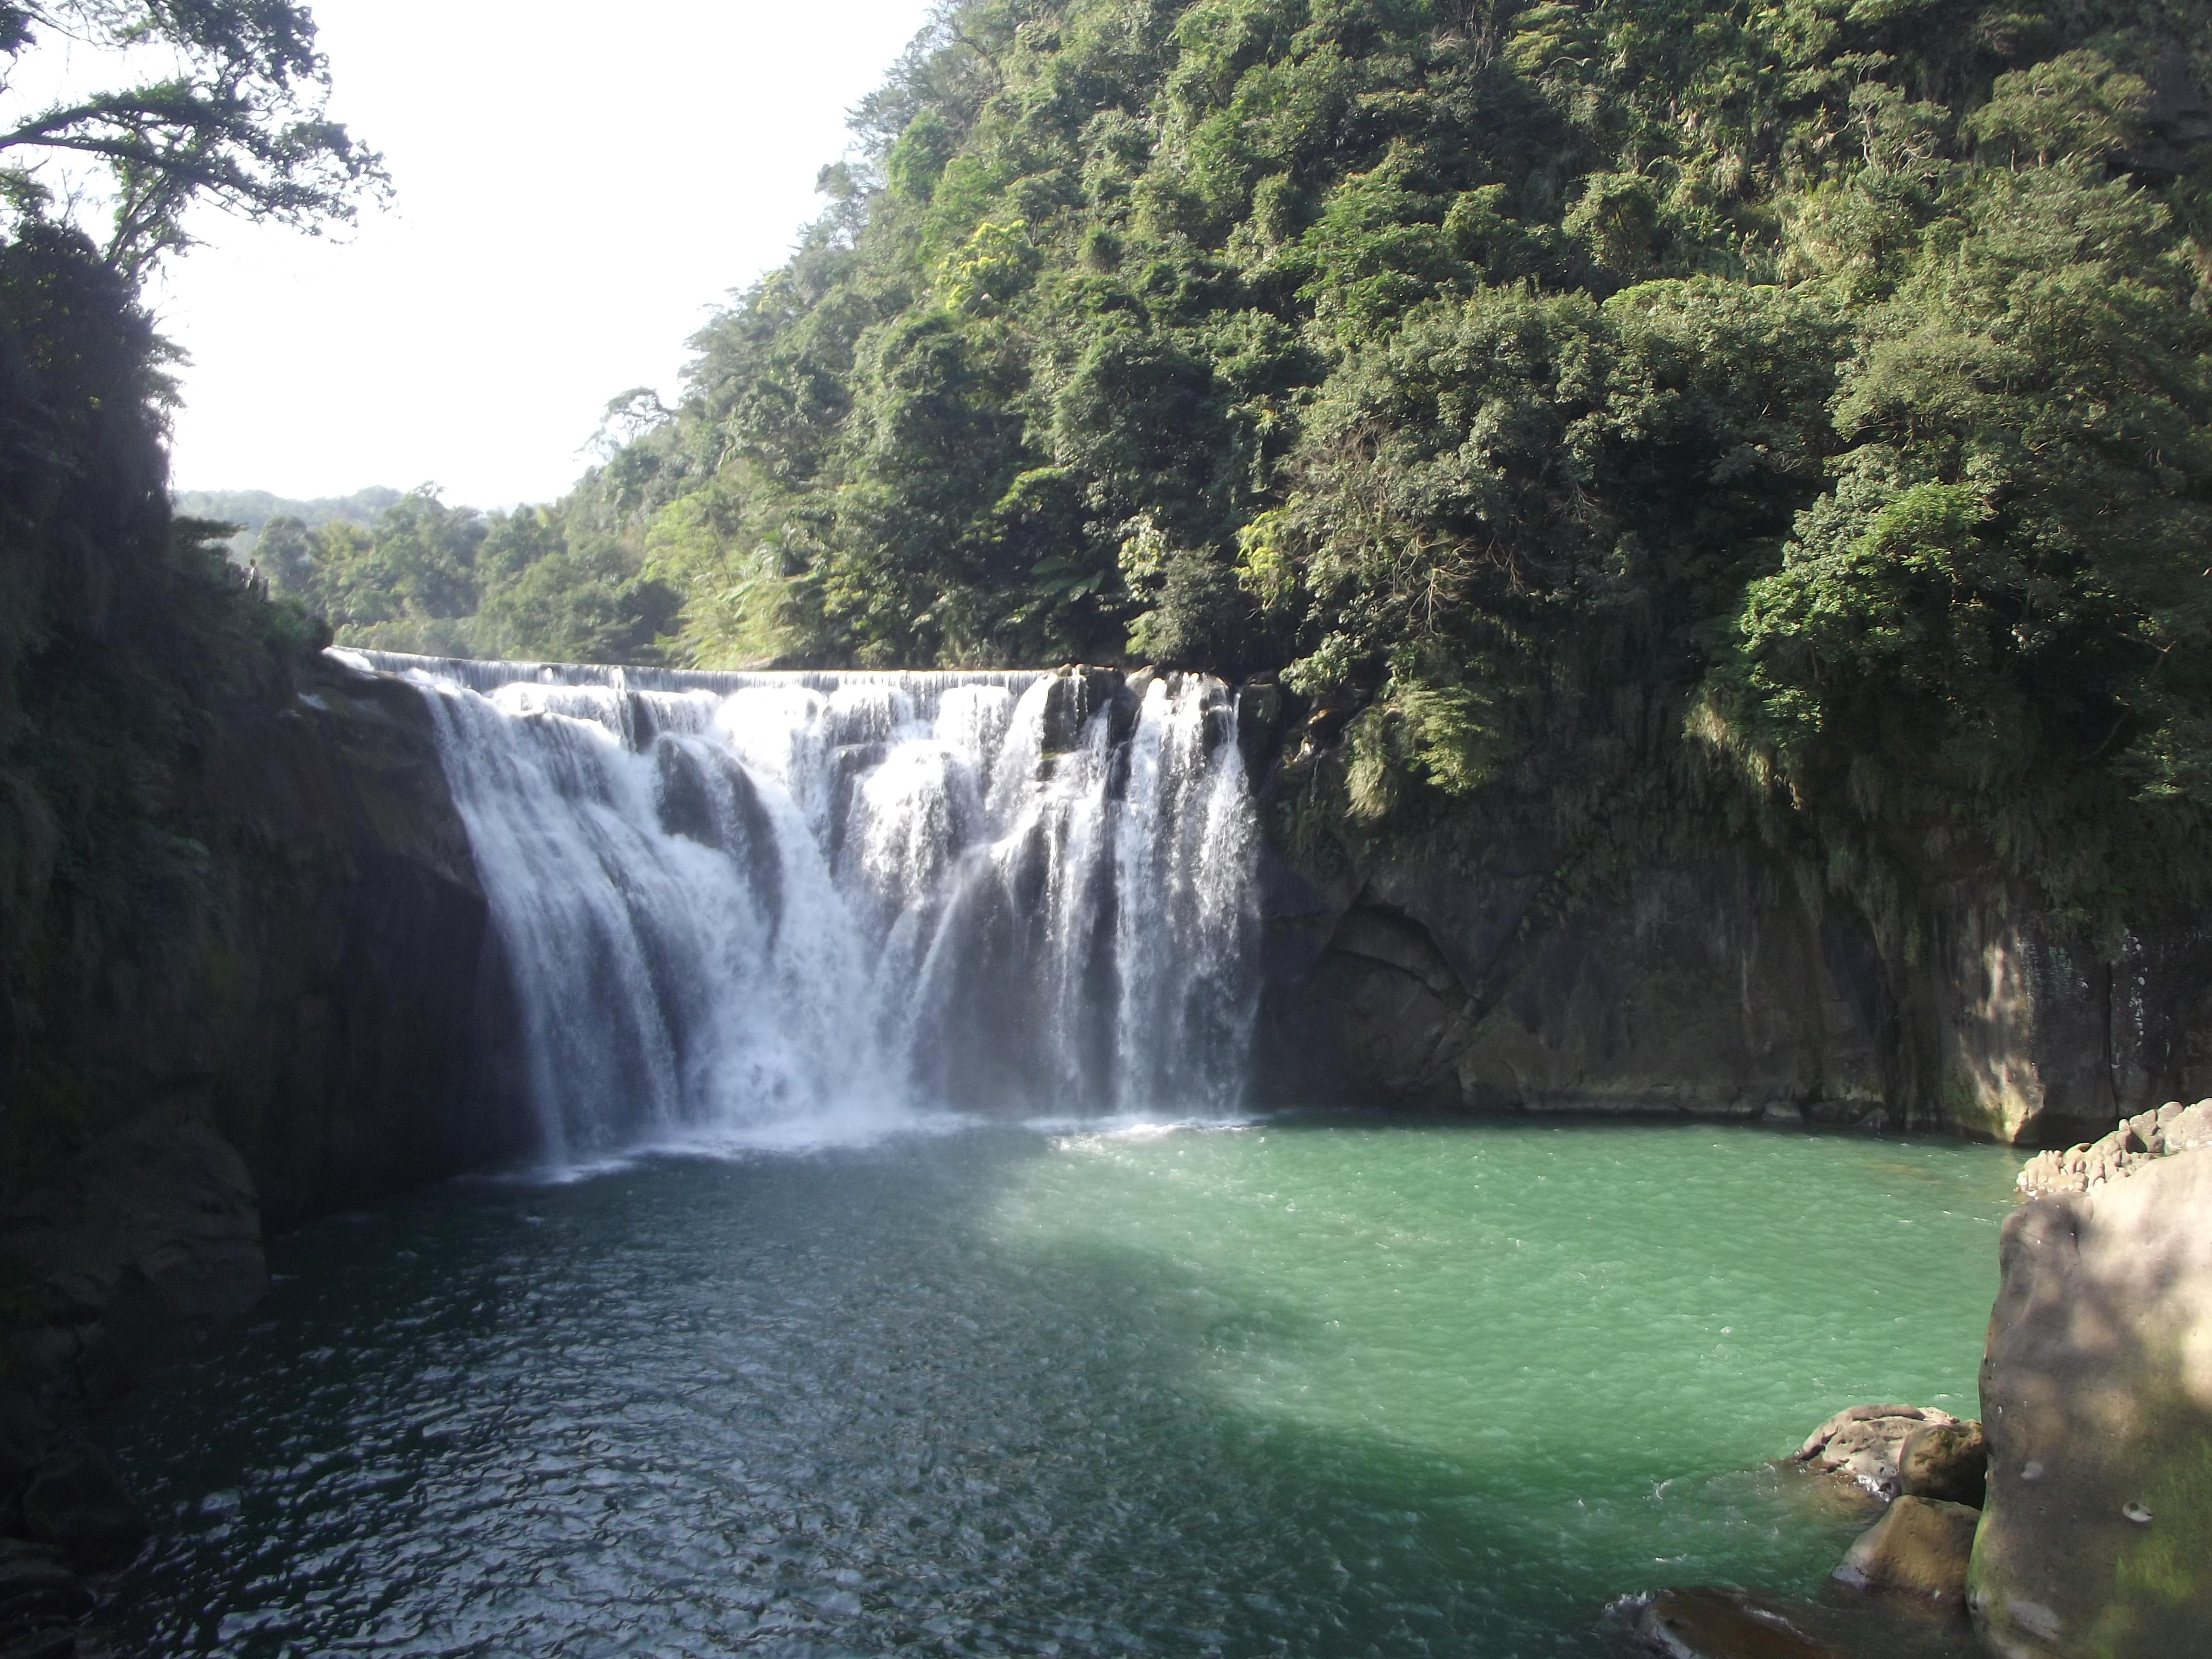 Shifen Waterfall clipart #1, Download drawings